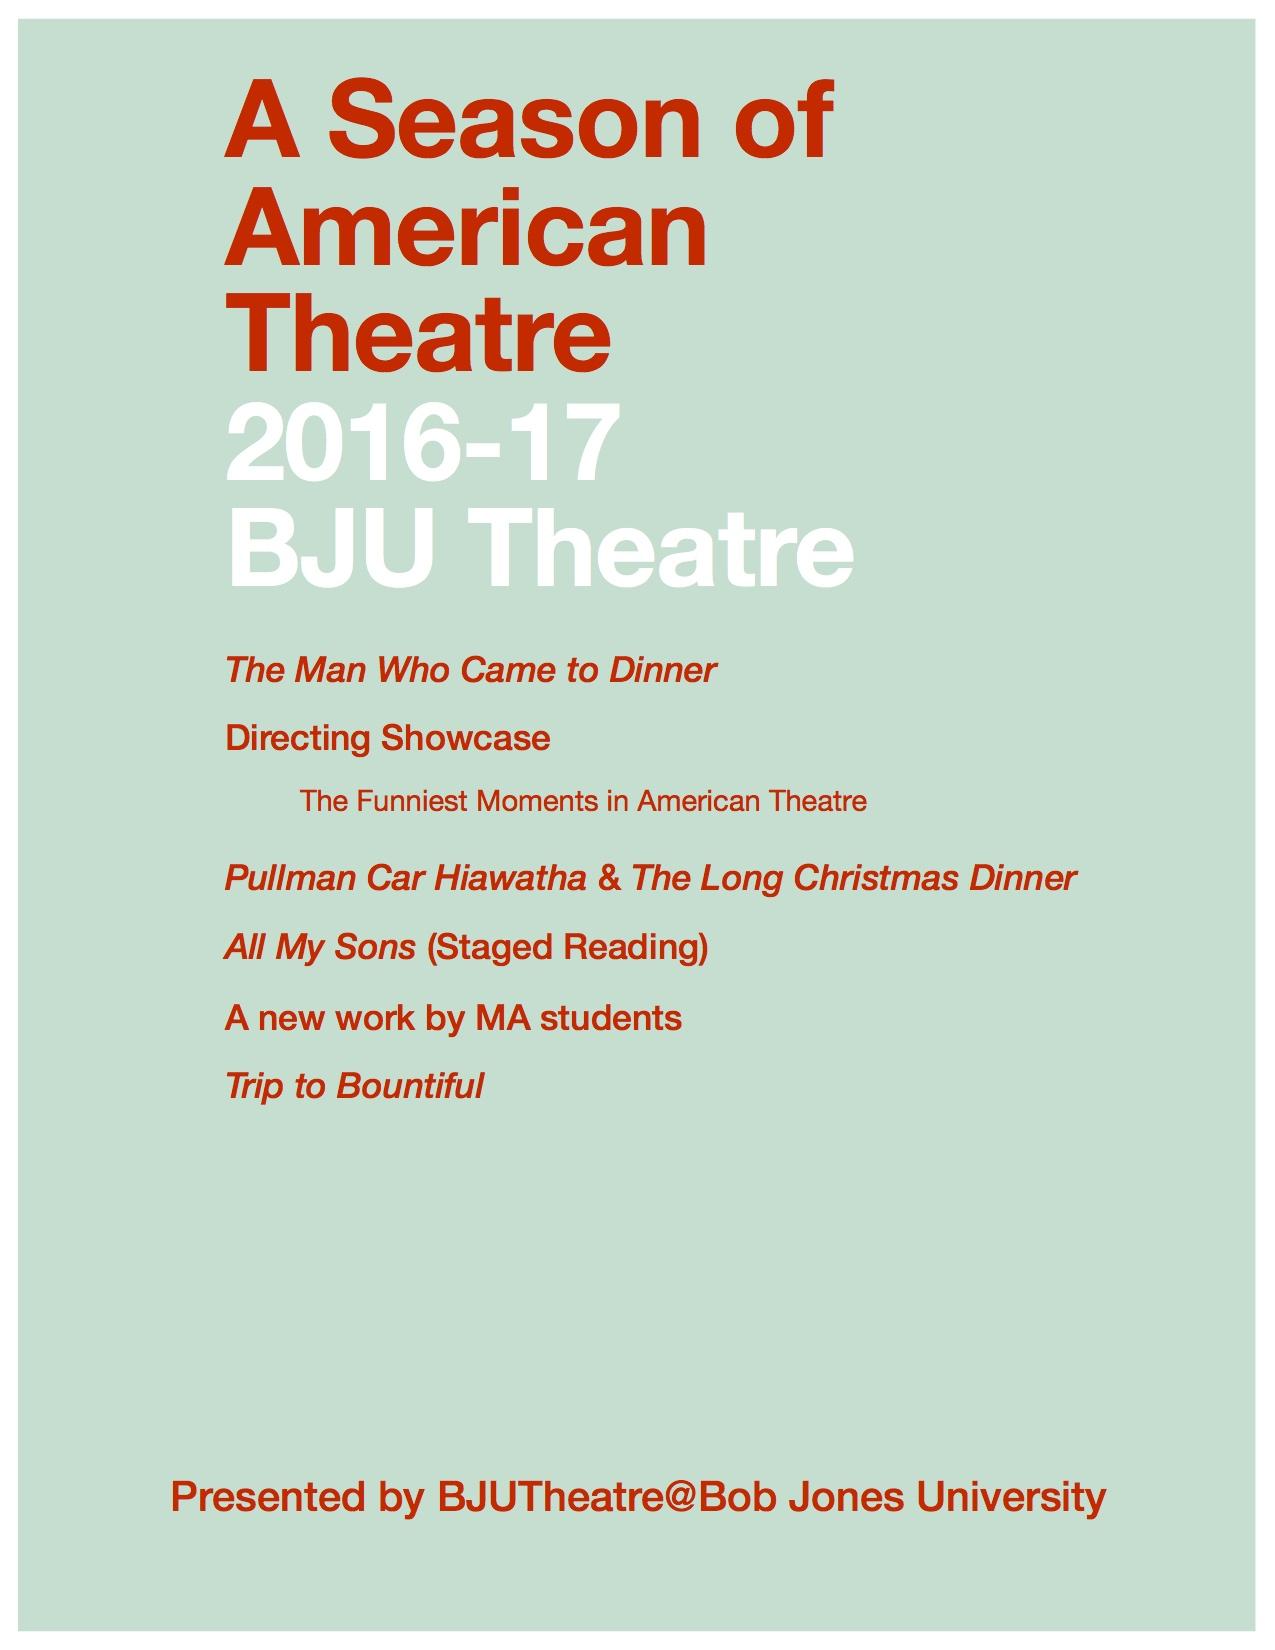 2016-2017 Theatre Arts Season